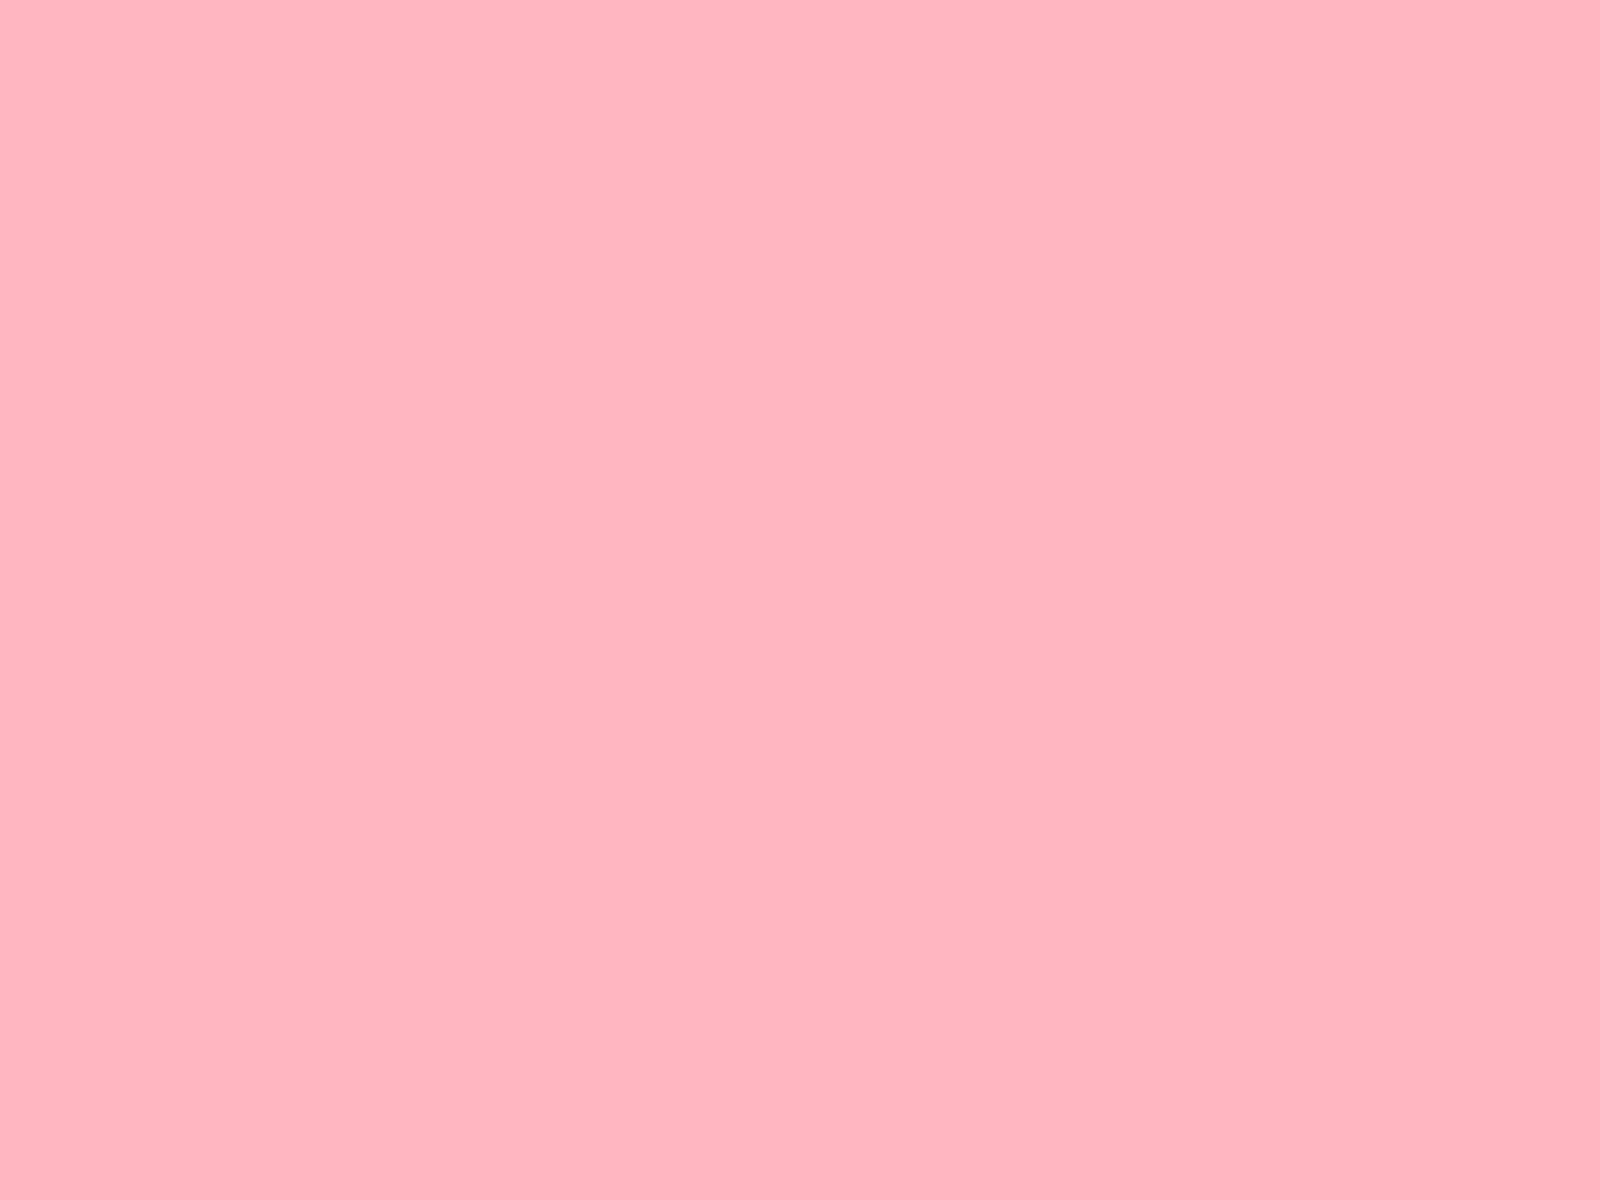 1600x1200 Light Pink Solid Color Background